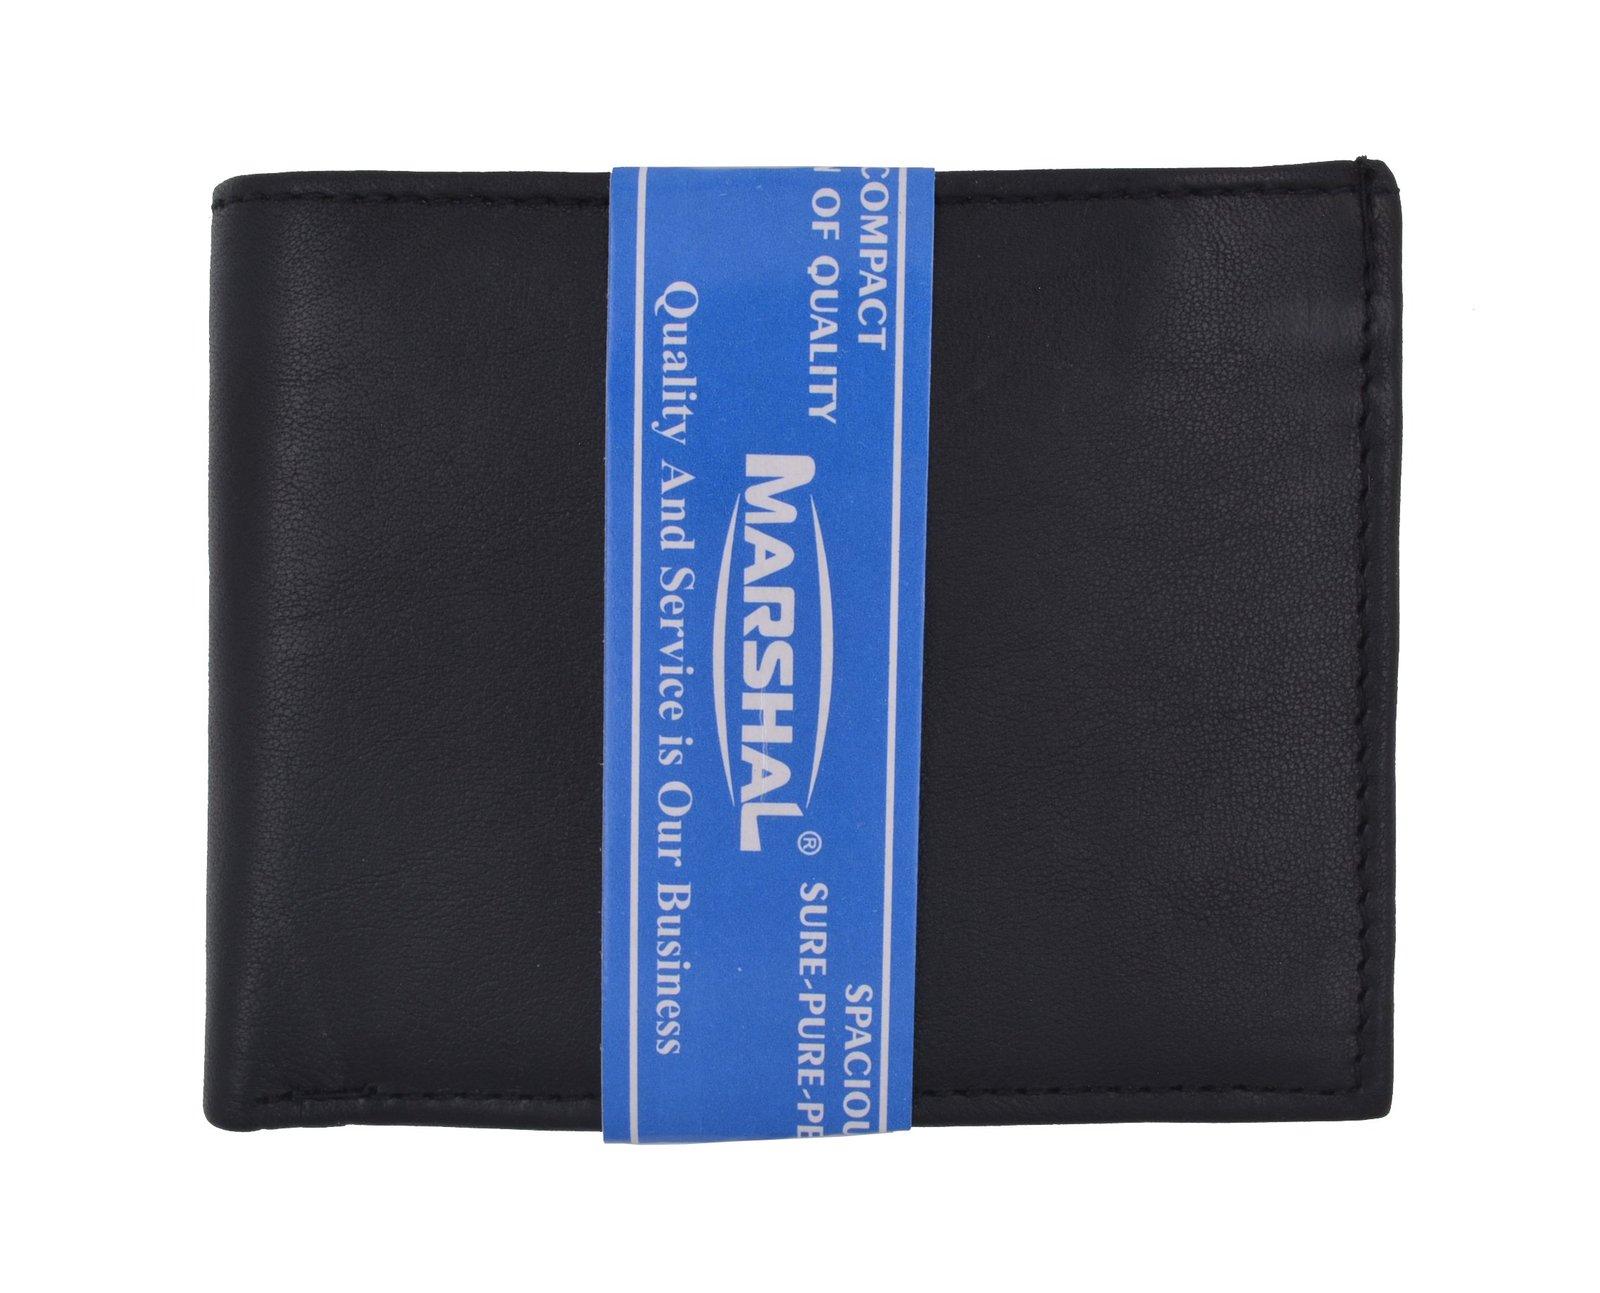 Moga Slim Compact Genuine Leather Key Holder Wallet Pouch for Men /& Women